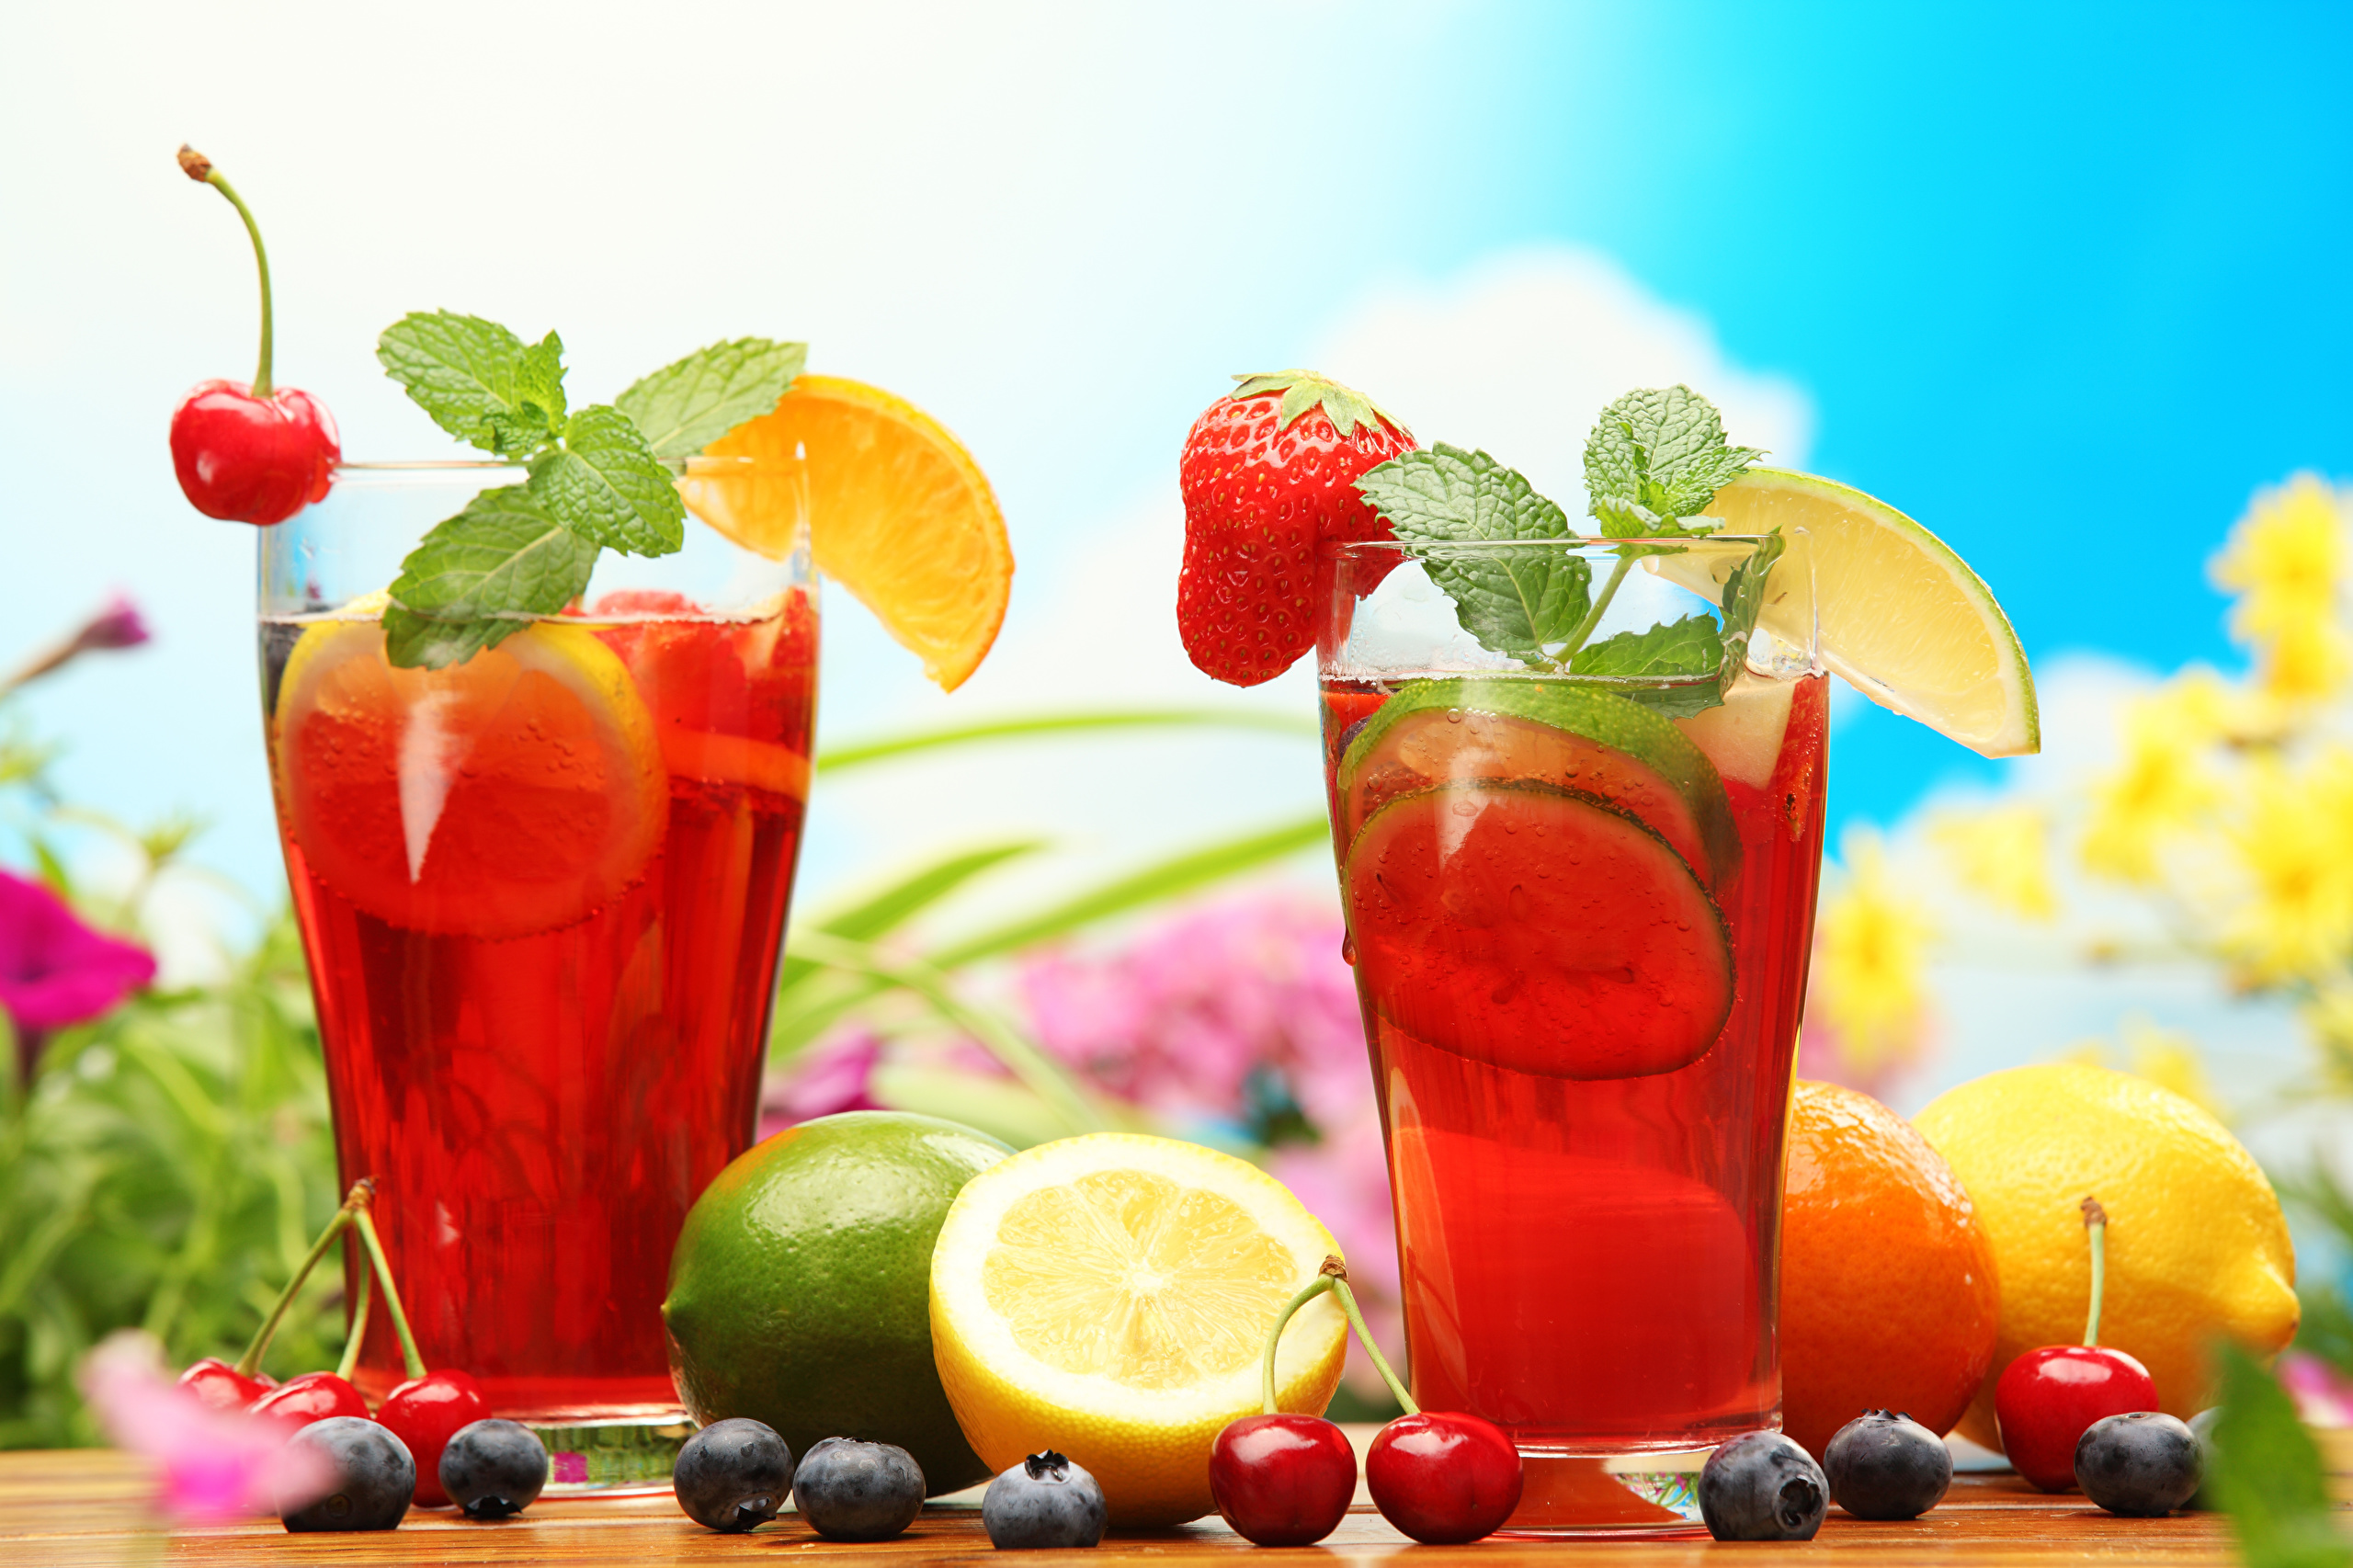 еда напитки лайм лимон апельсин клубника вишня коктейль food drinks lime lemon orange strawberry cherry cocktail  № 2154639 бесплатно